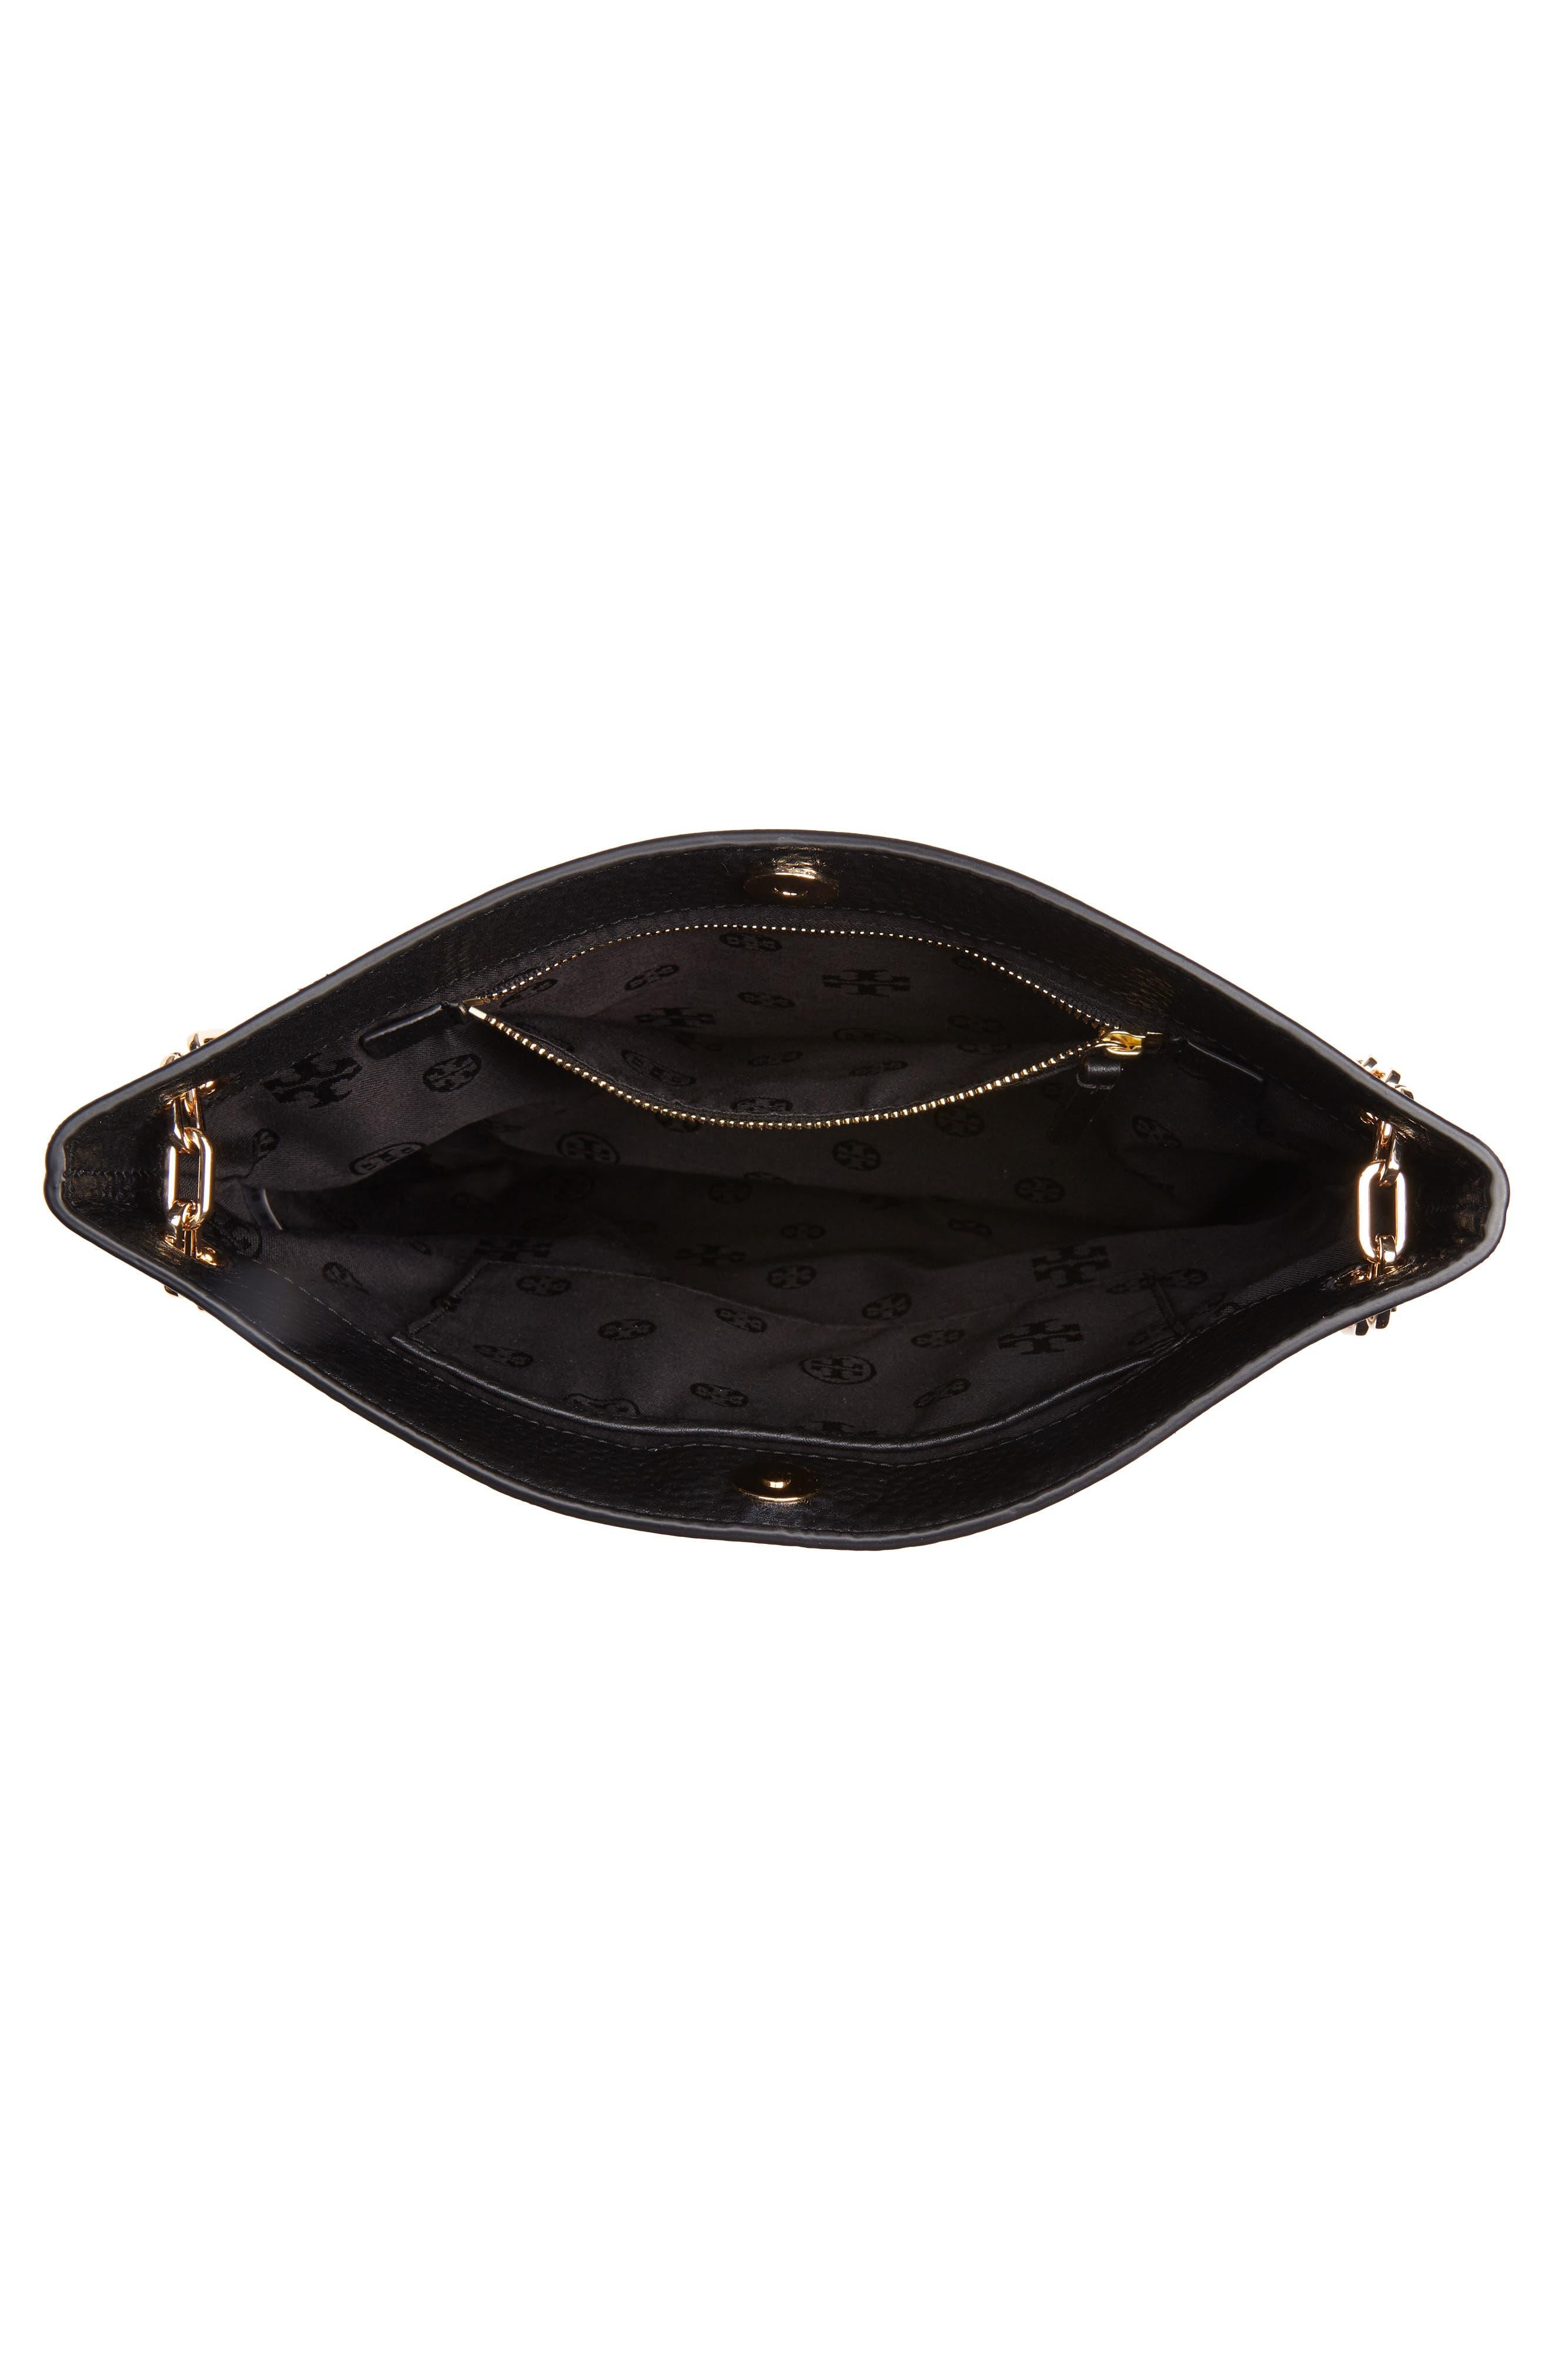 TORY BURCH, Marsden Swingpack Leather Crossbody Bag, Alternate thumbnail 4, color, 001